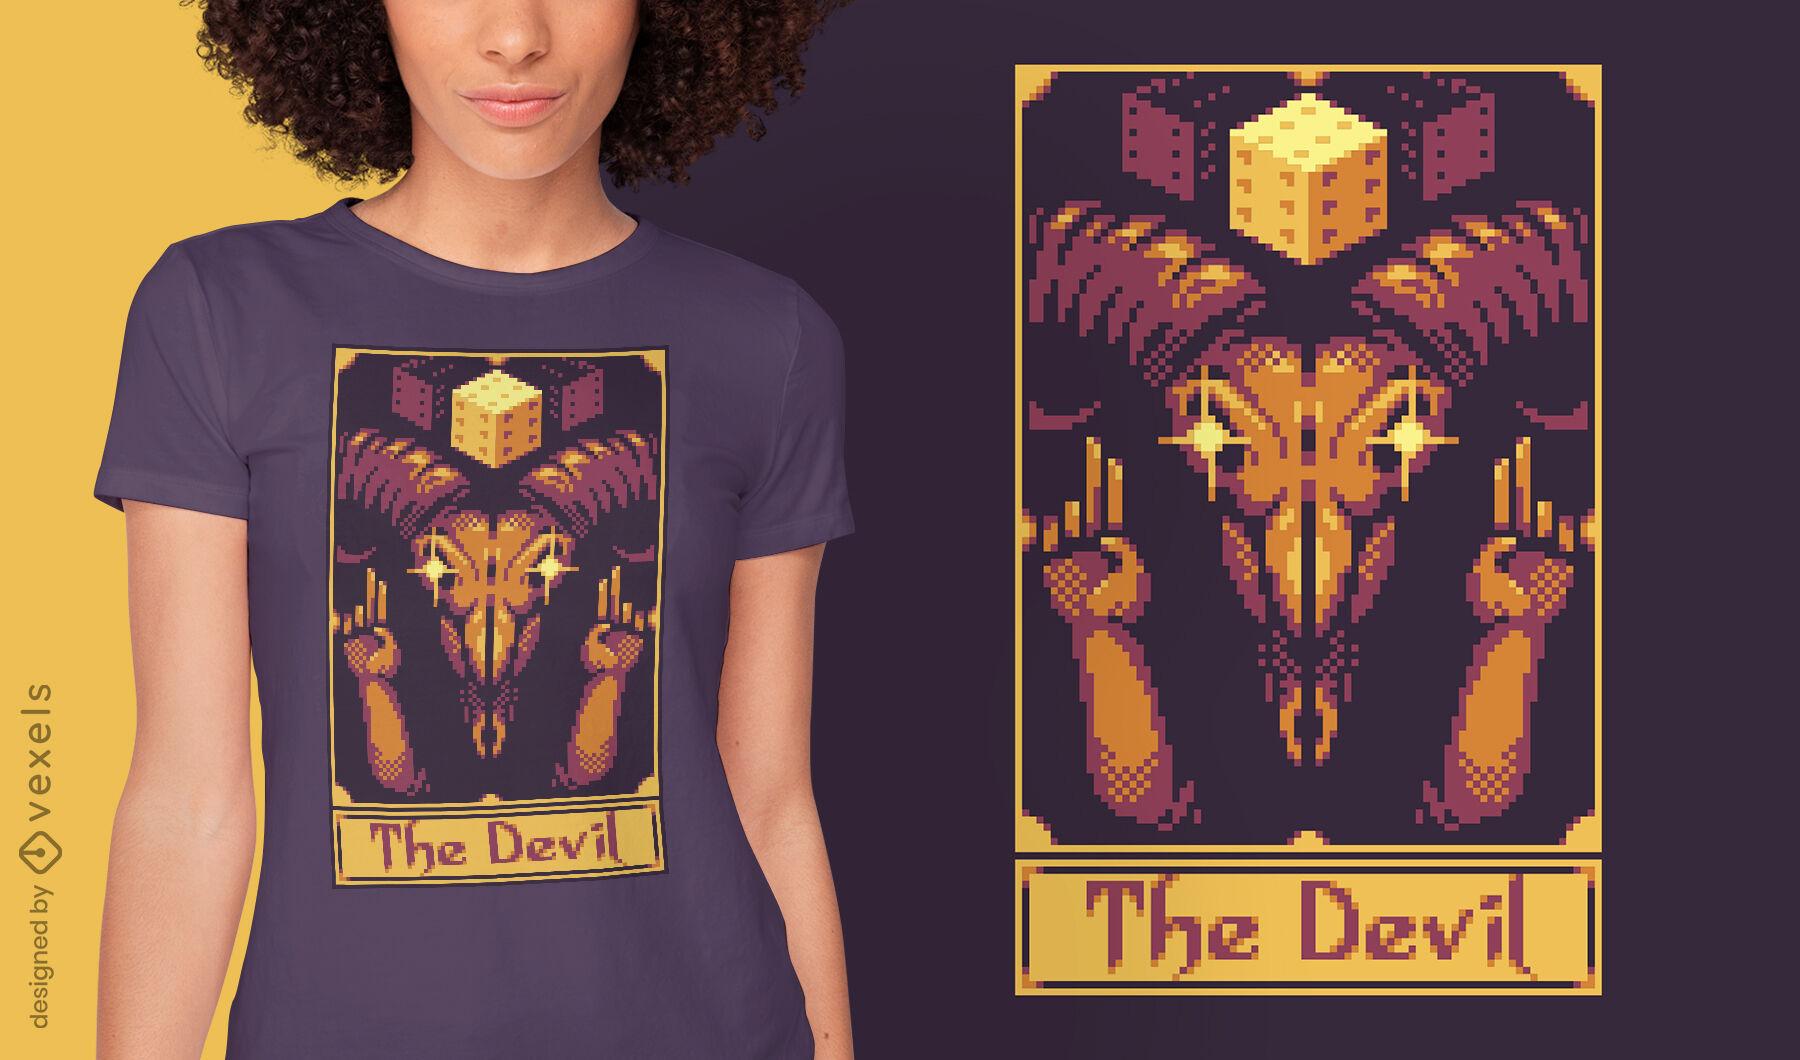 Pixel tarot card devil t-shirt design